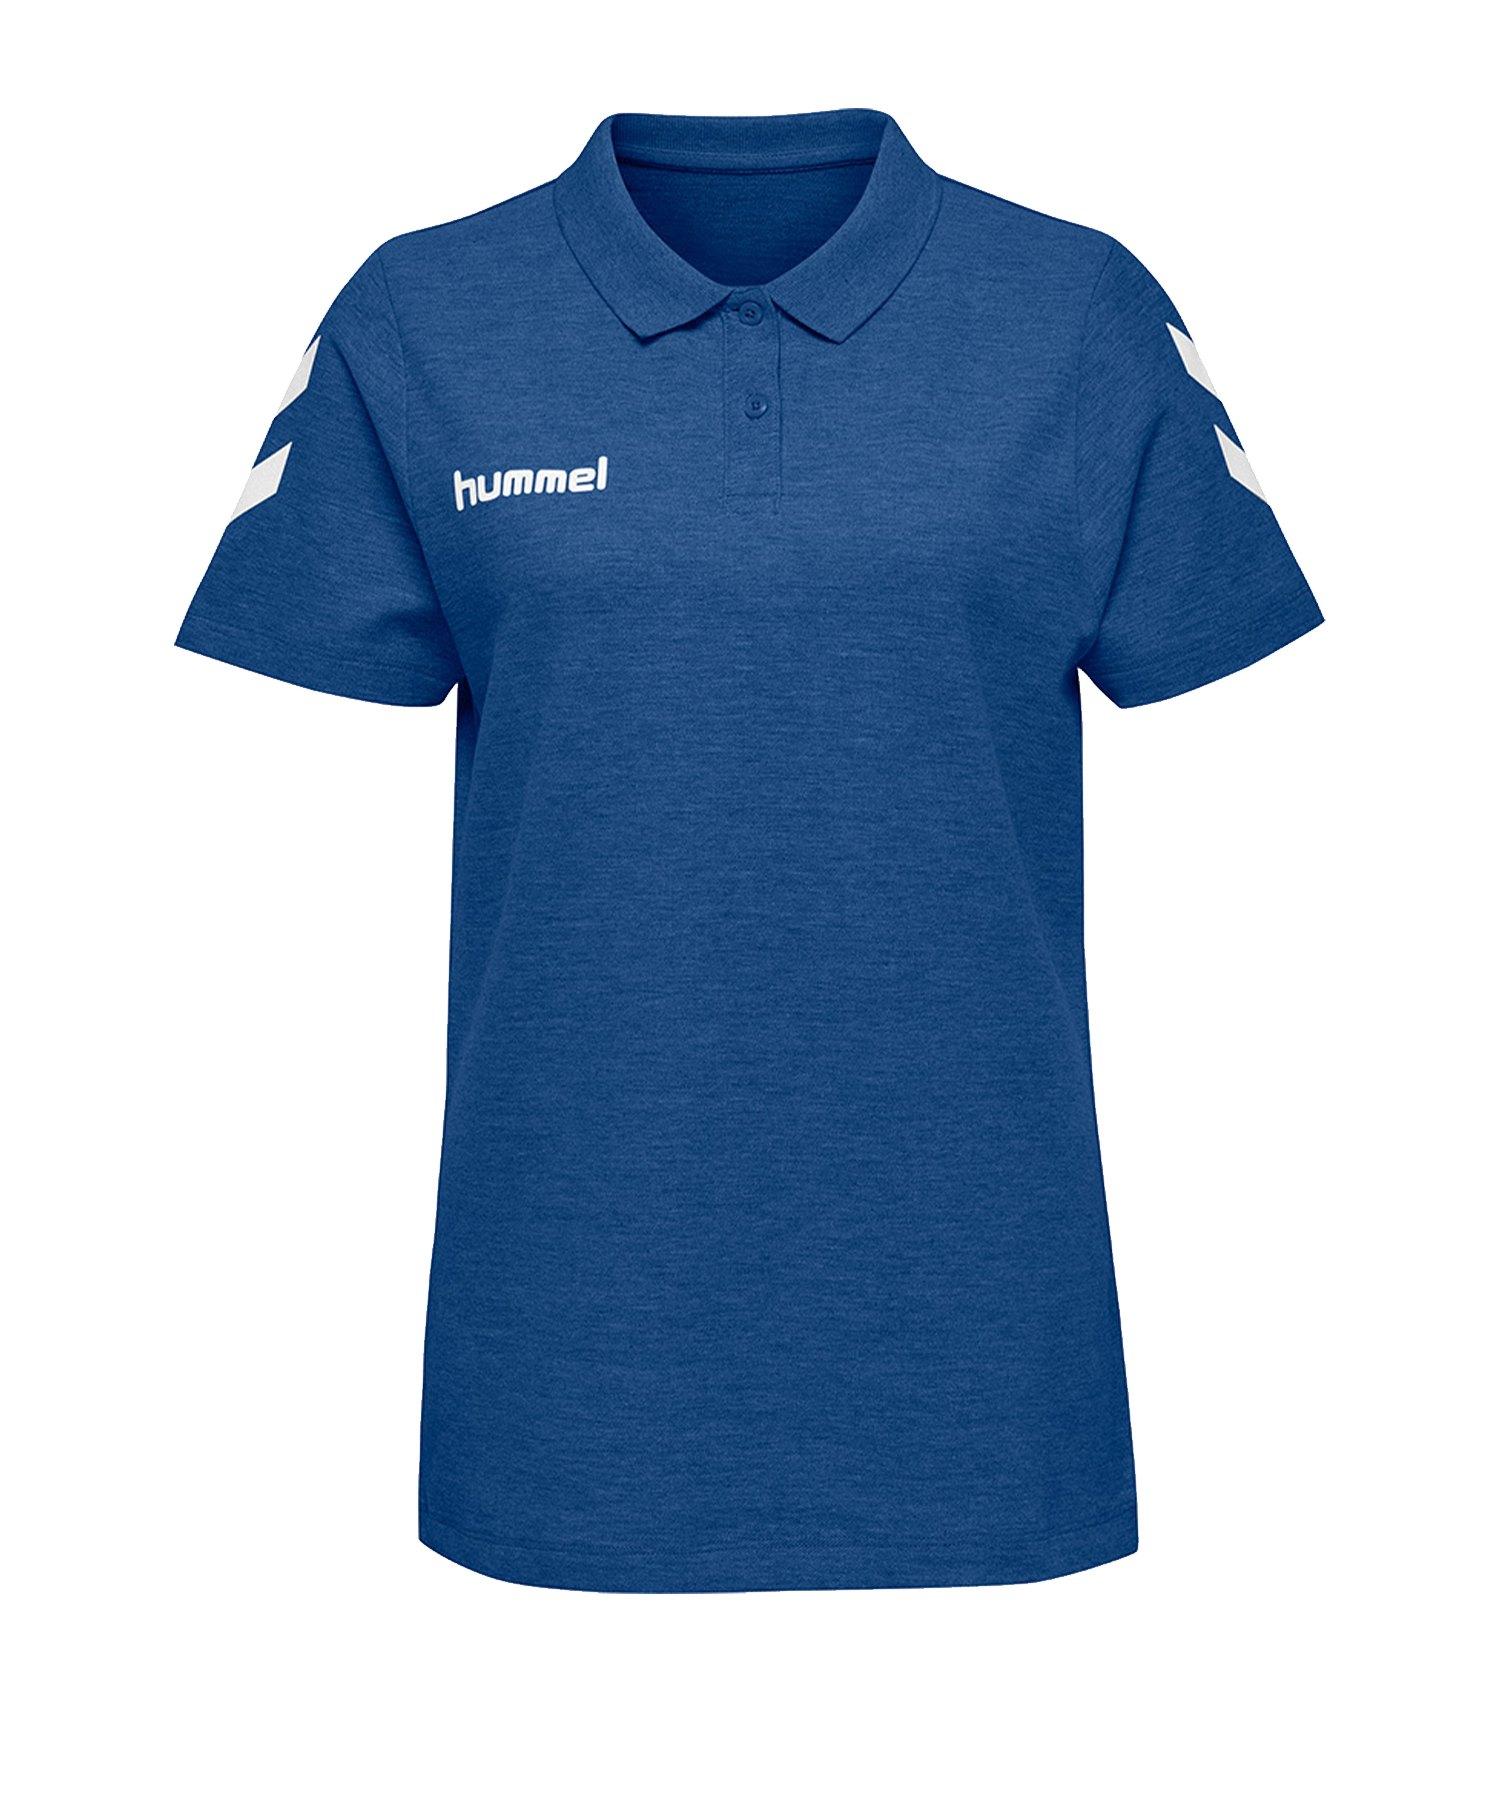 Hummel Cotton Poloshirt Damen Blau F7045 - Blau